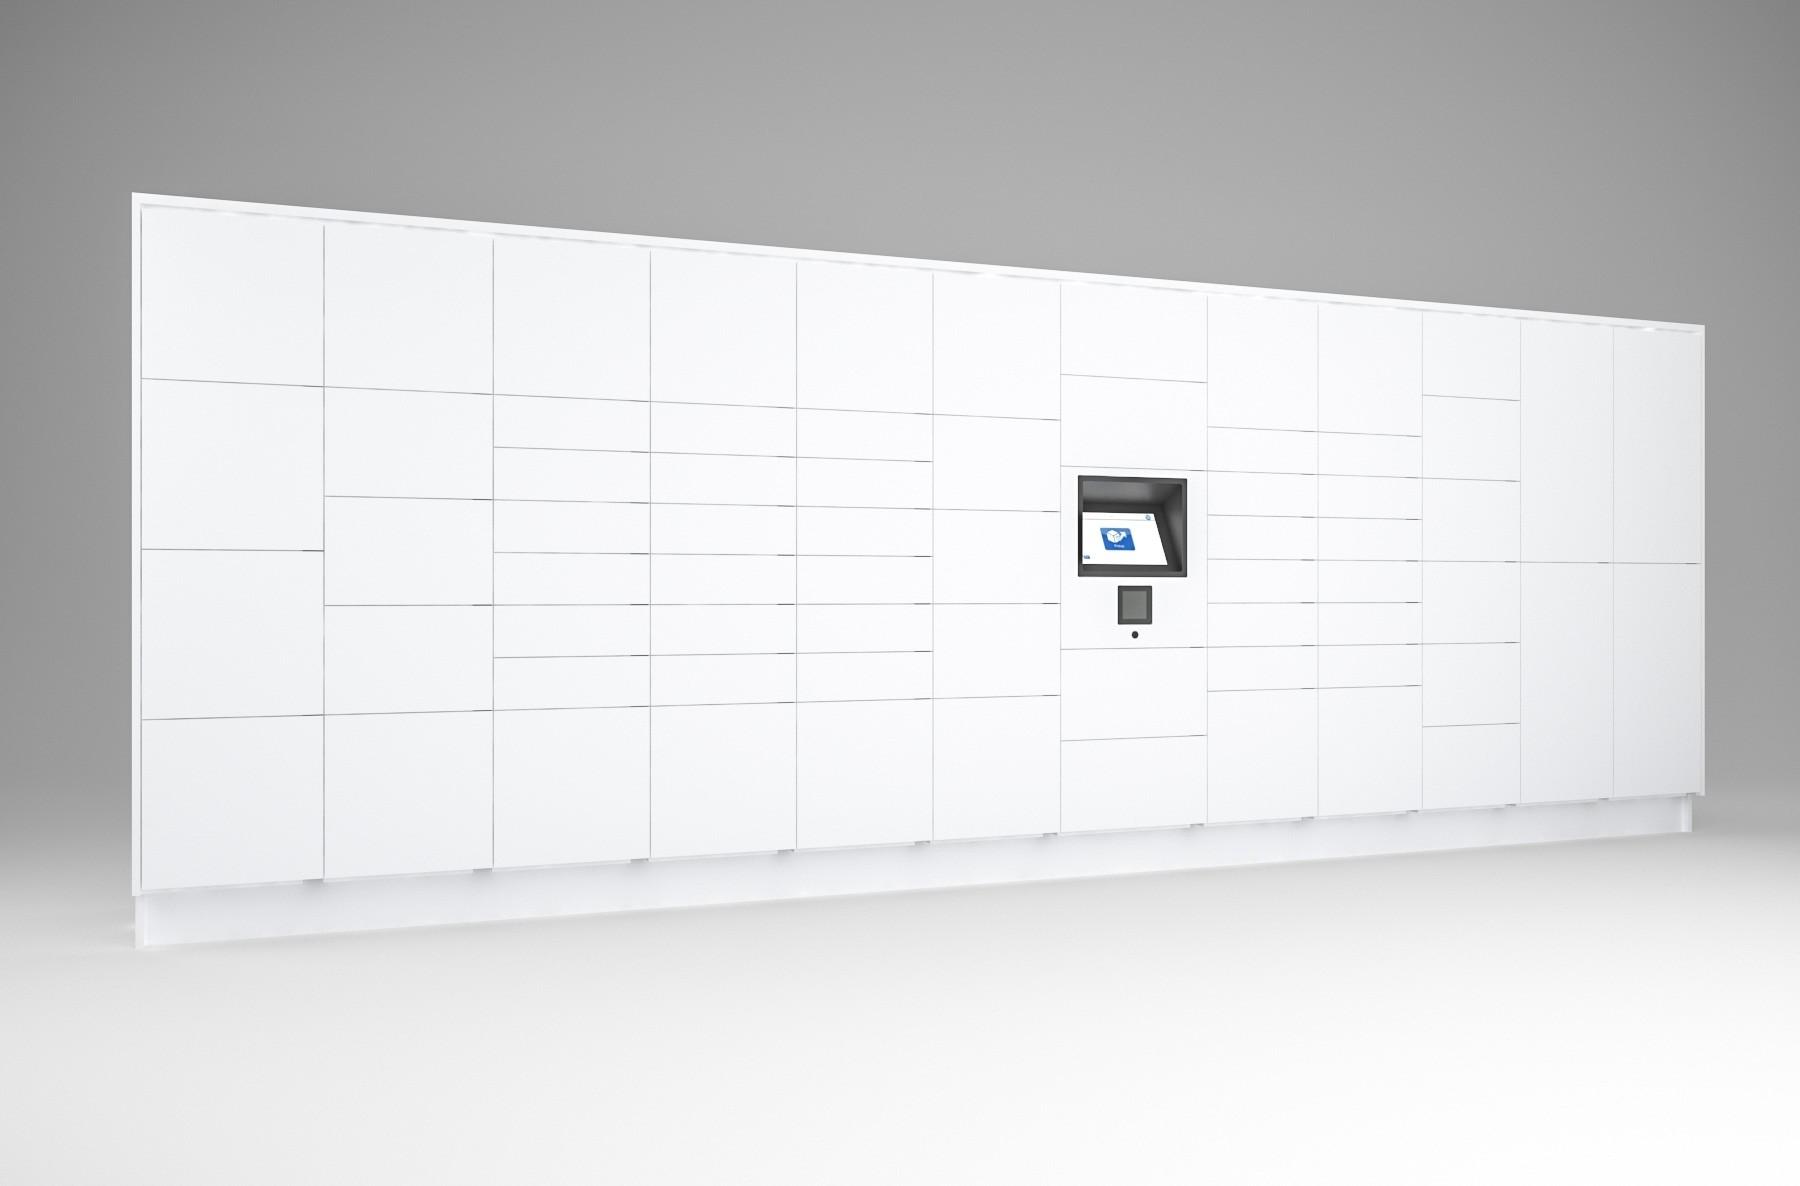 68 Total Openings Laminate Smart Locker